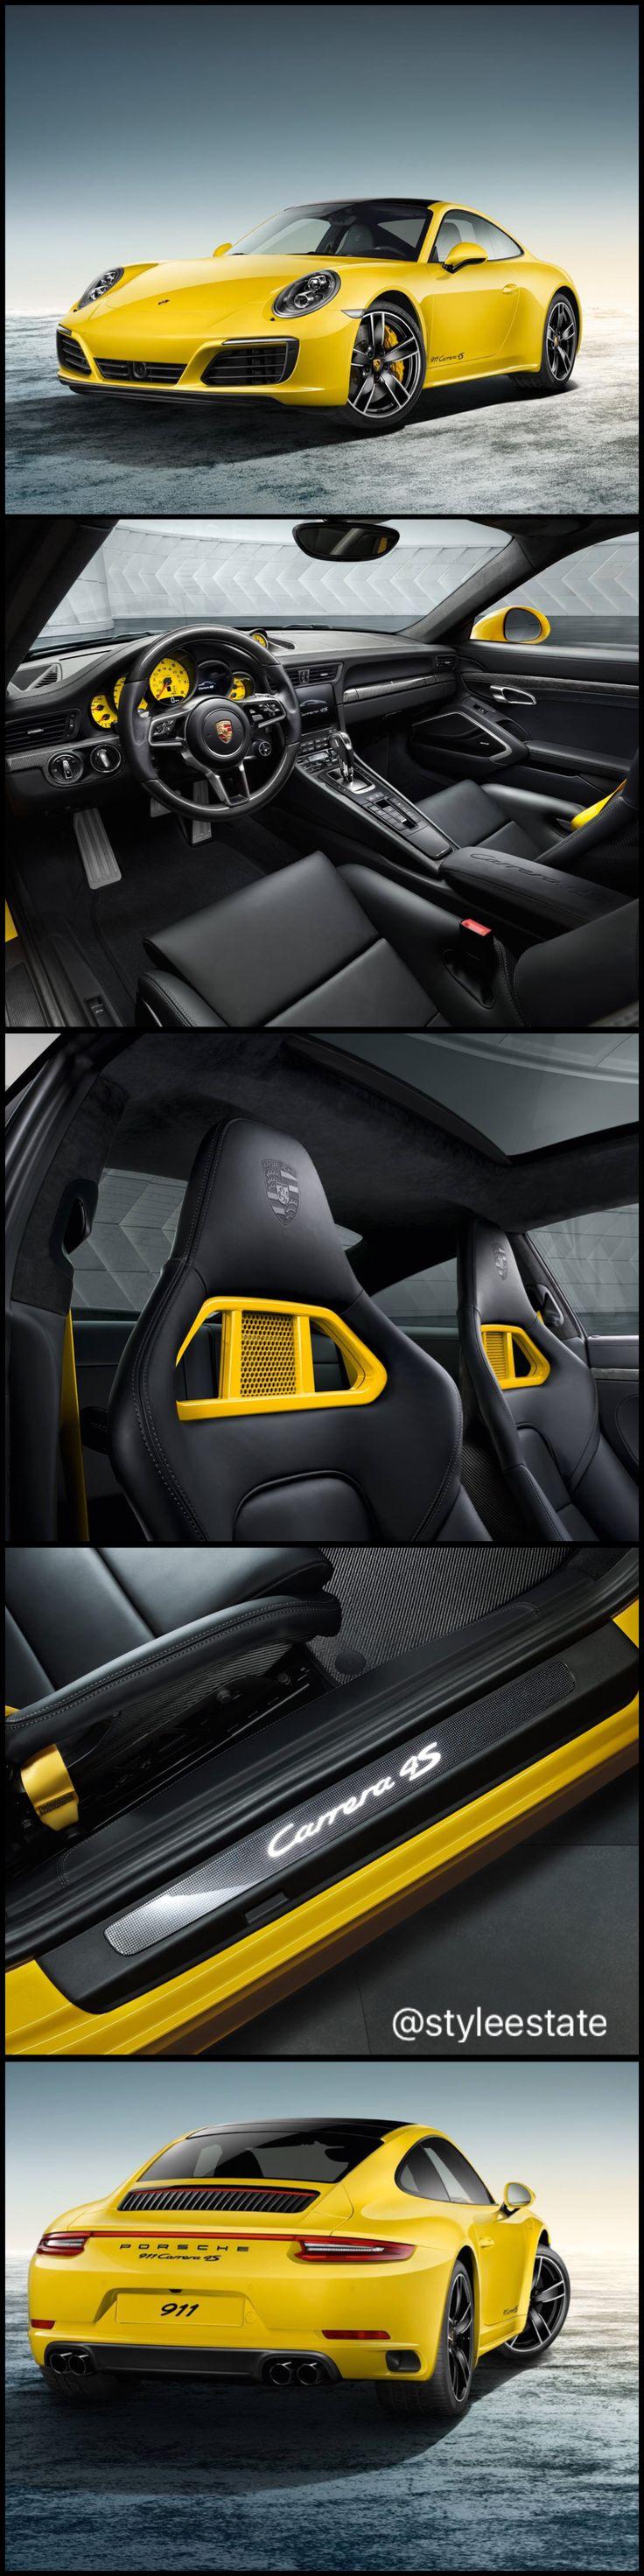 Porsche 911 Carrera 4S https://www.amazon.co.uk/Baby-Car-Mirror-Shatterproof-Installation/dp/B06XHG6SSY